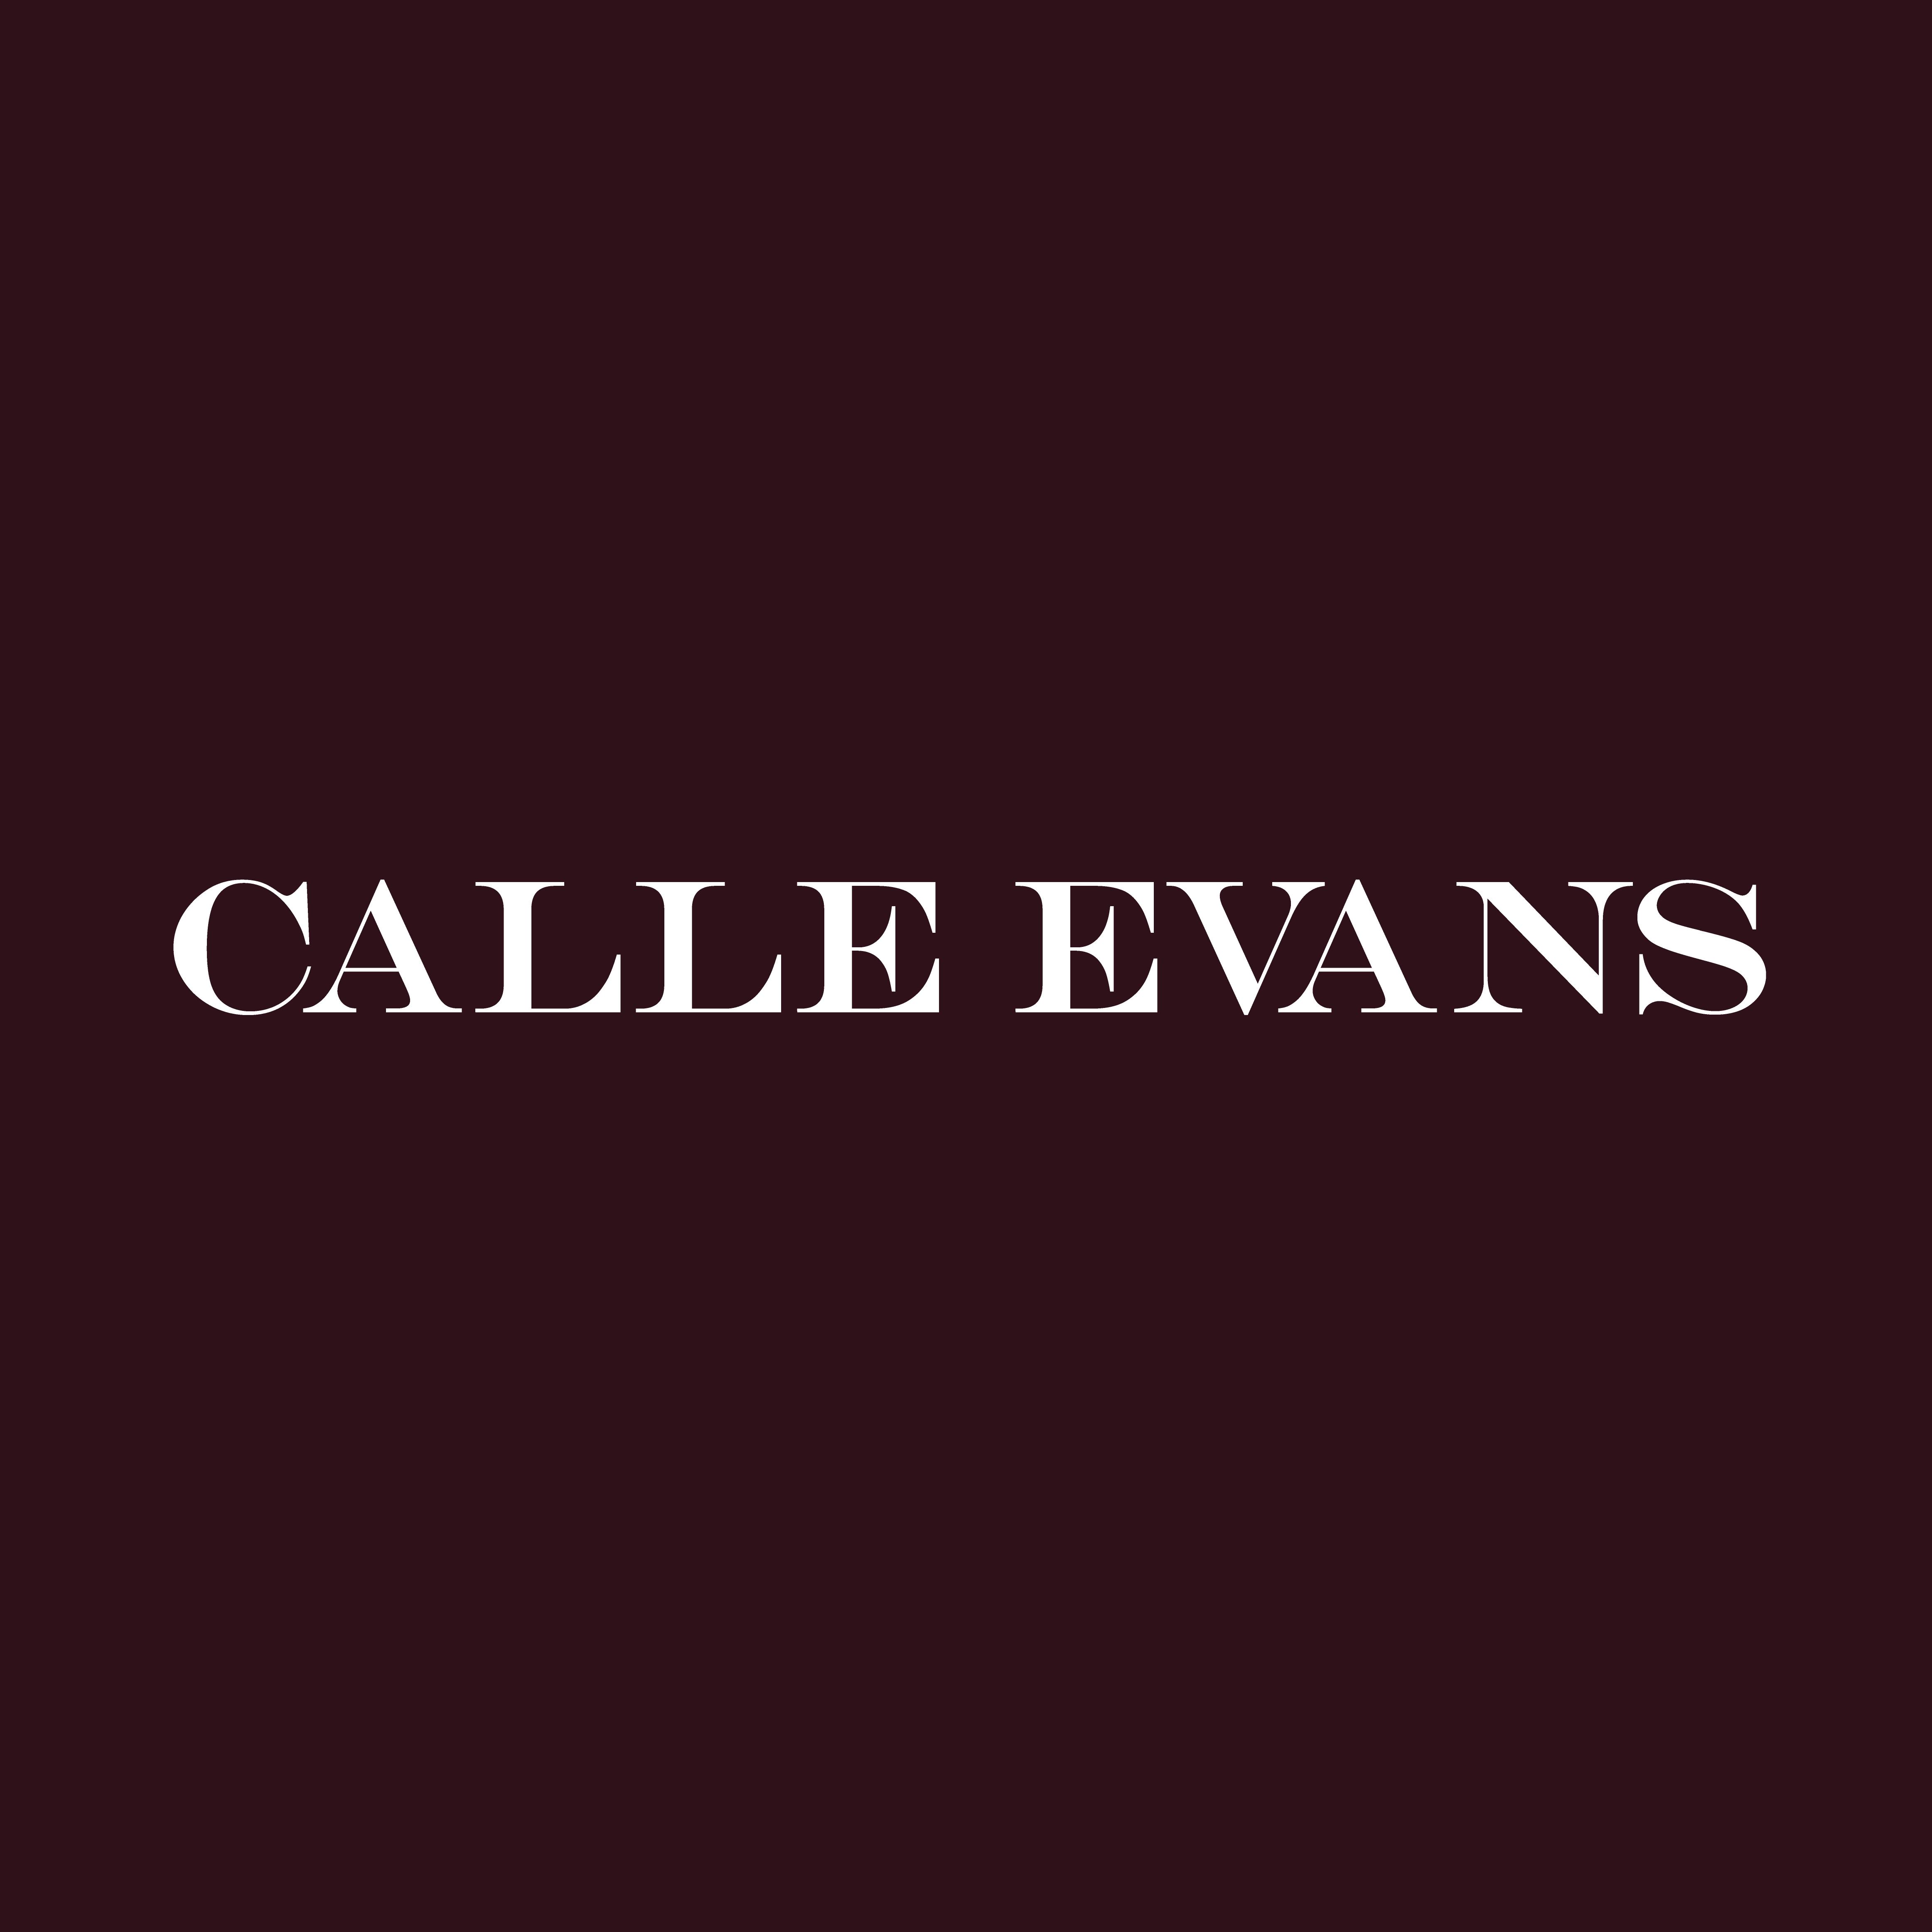 CALLE EVANS